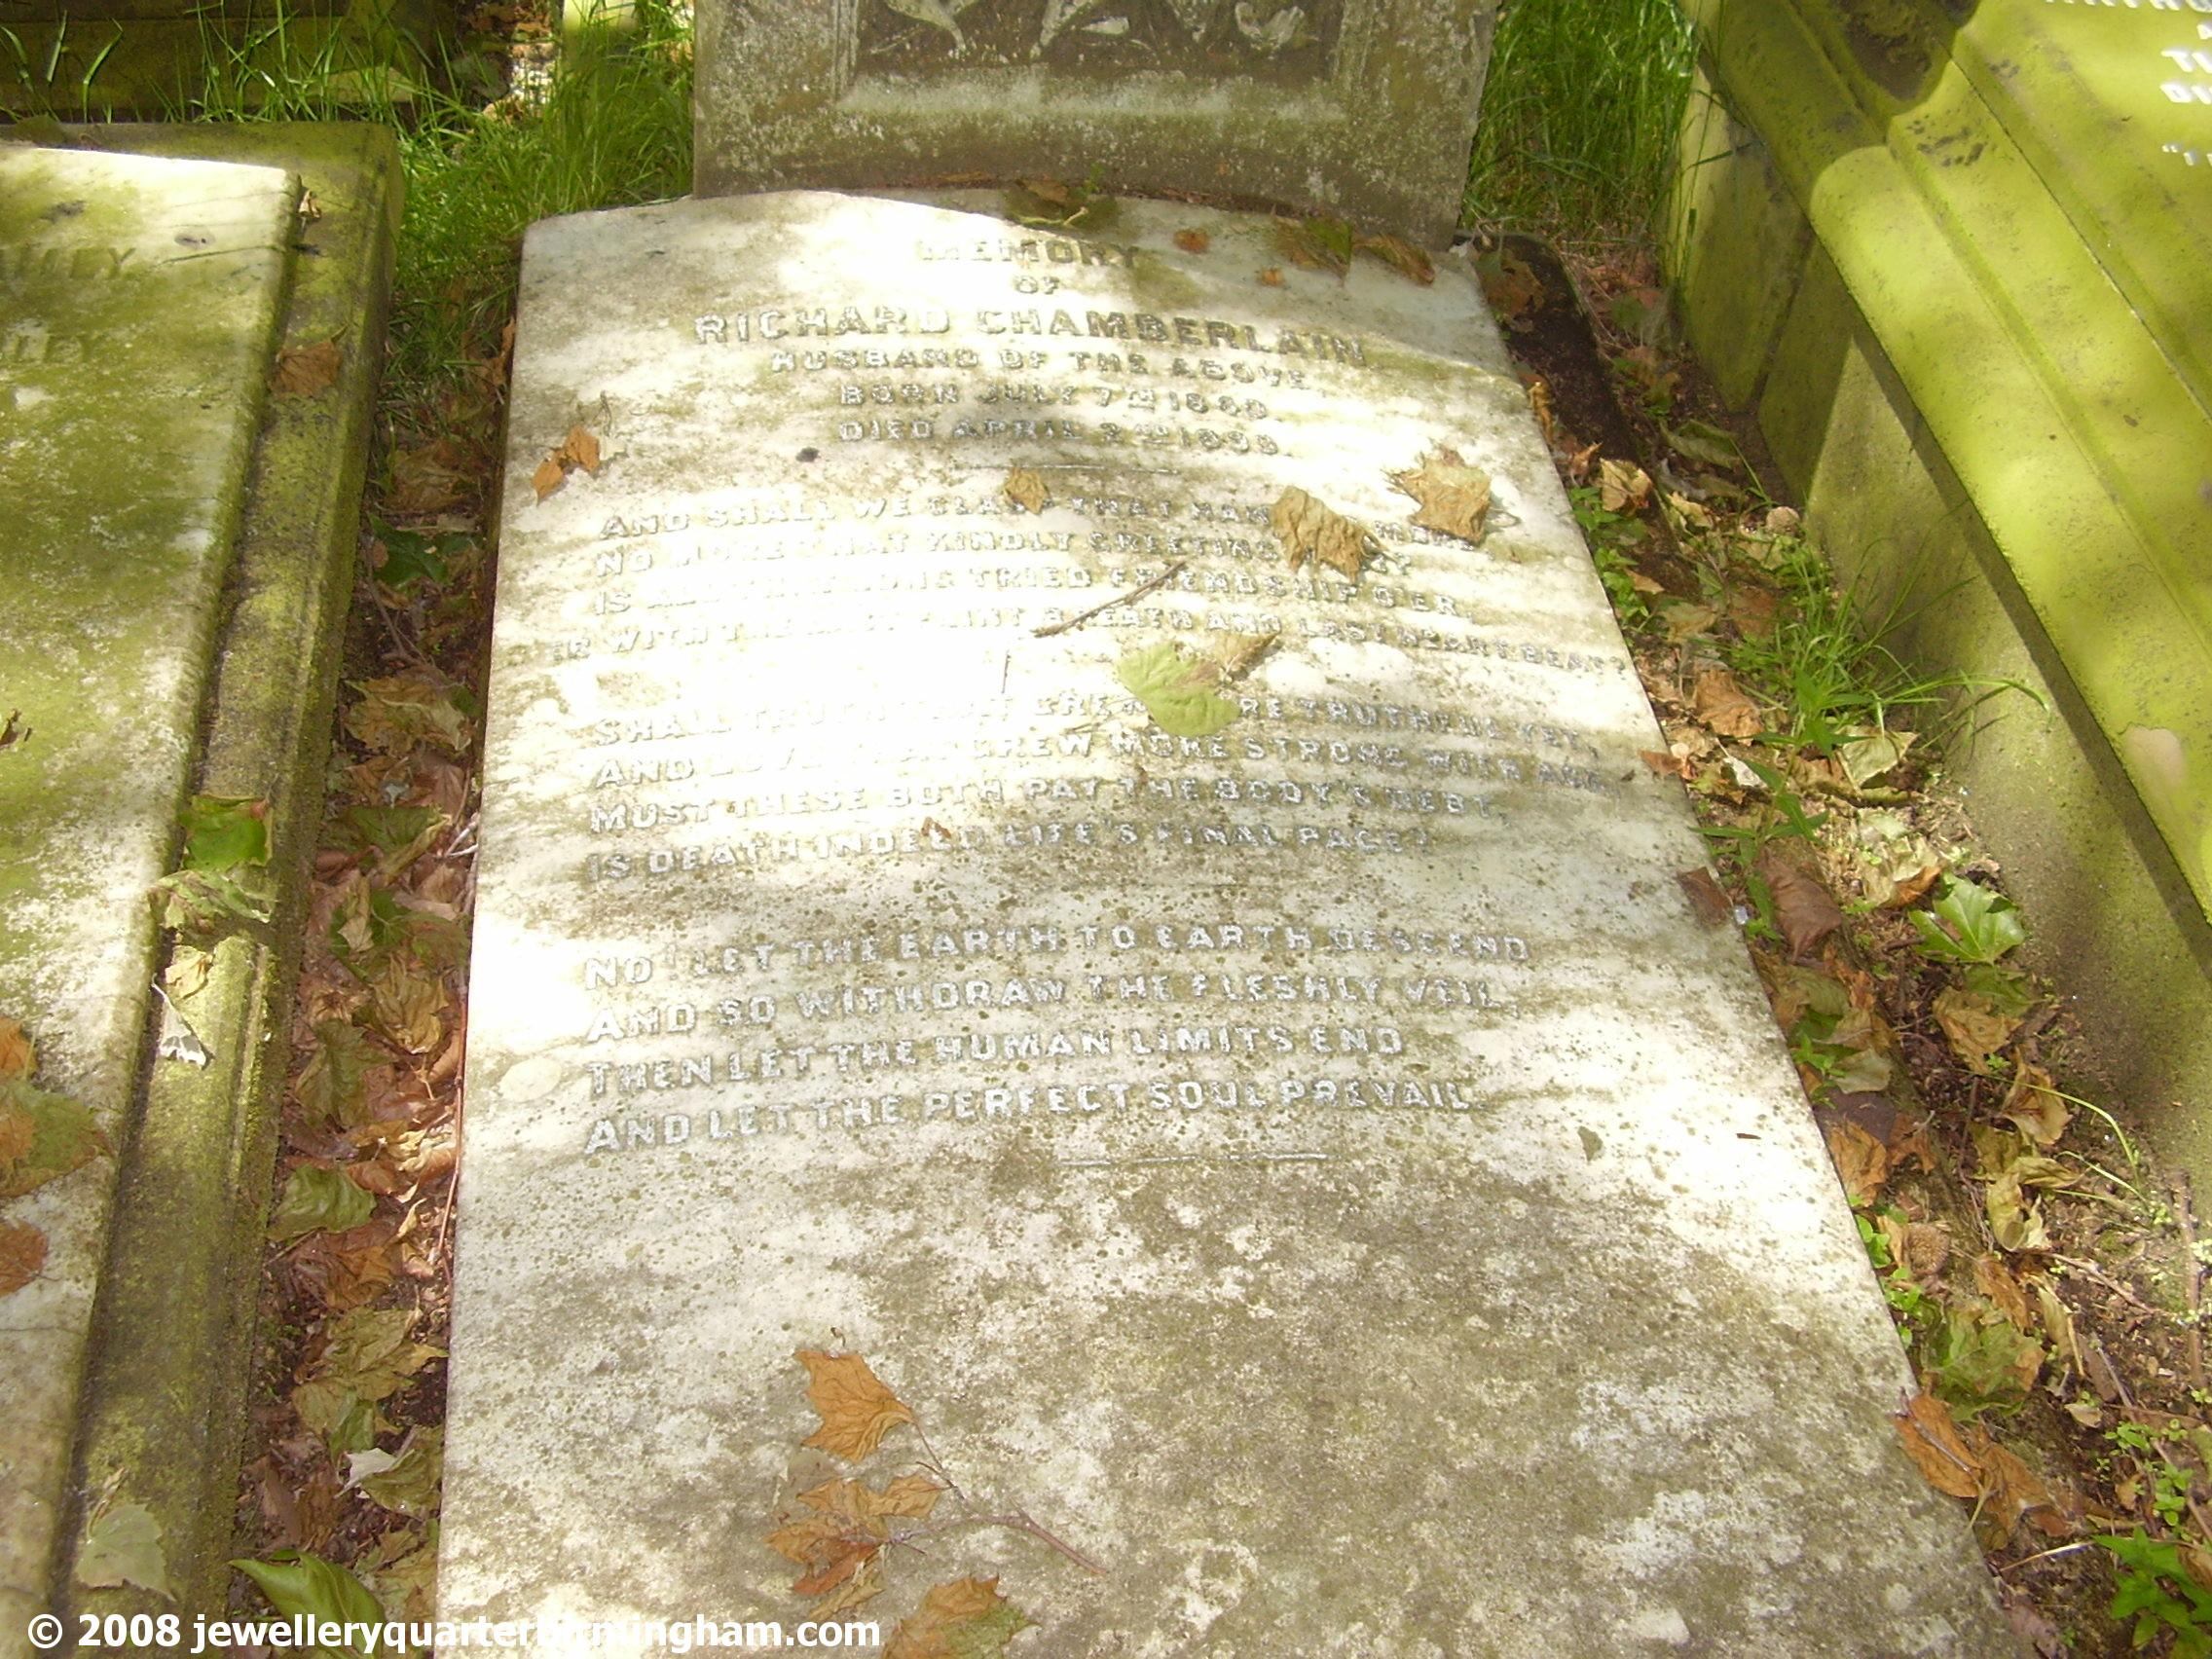 The-grave-in-Key-Hill-Cemetery-of-Richard-Chamberlain.jpg 2008